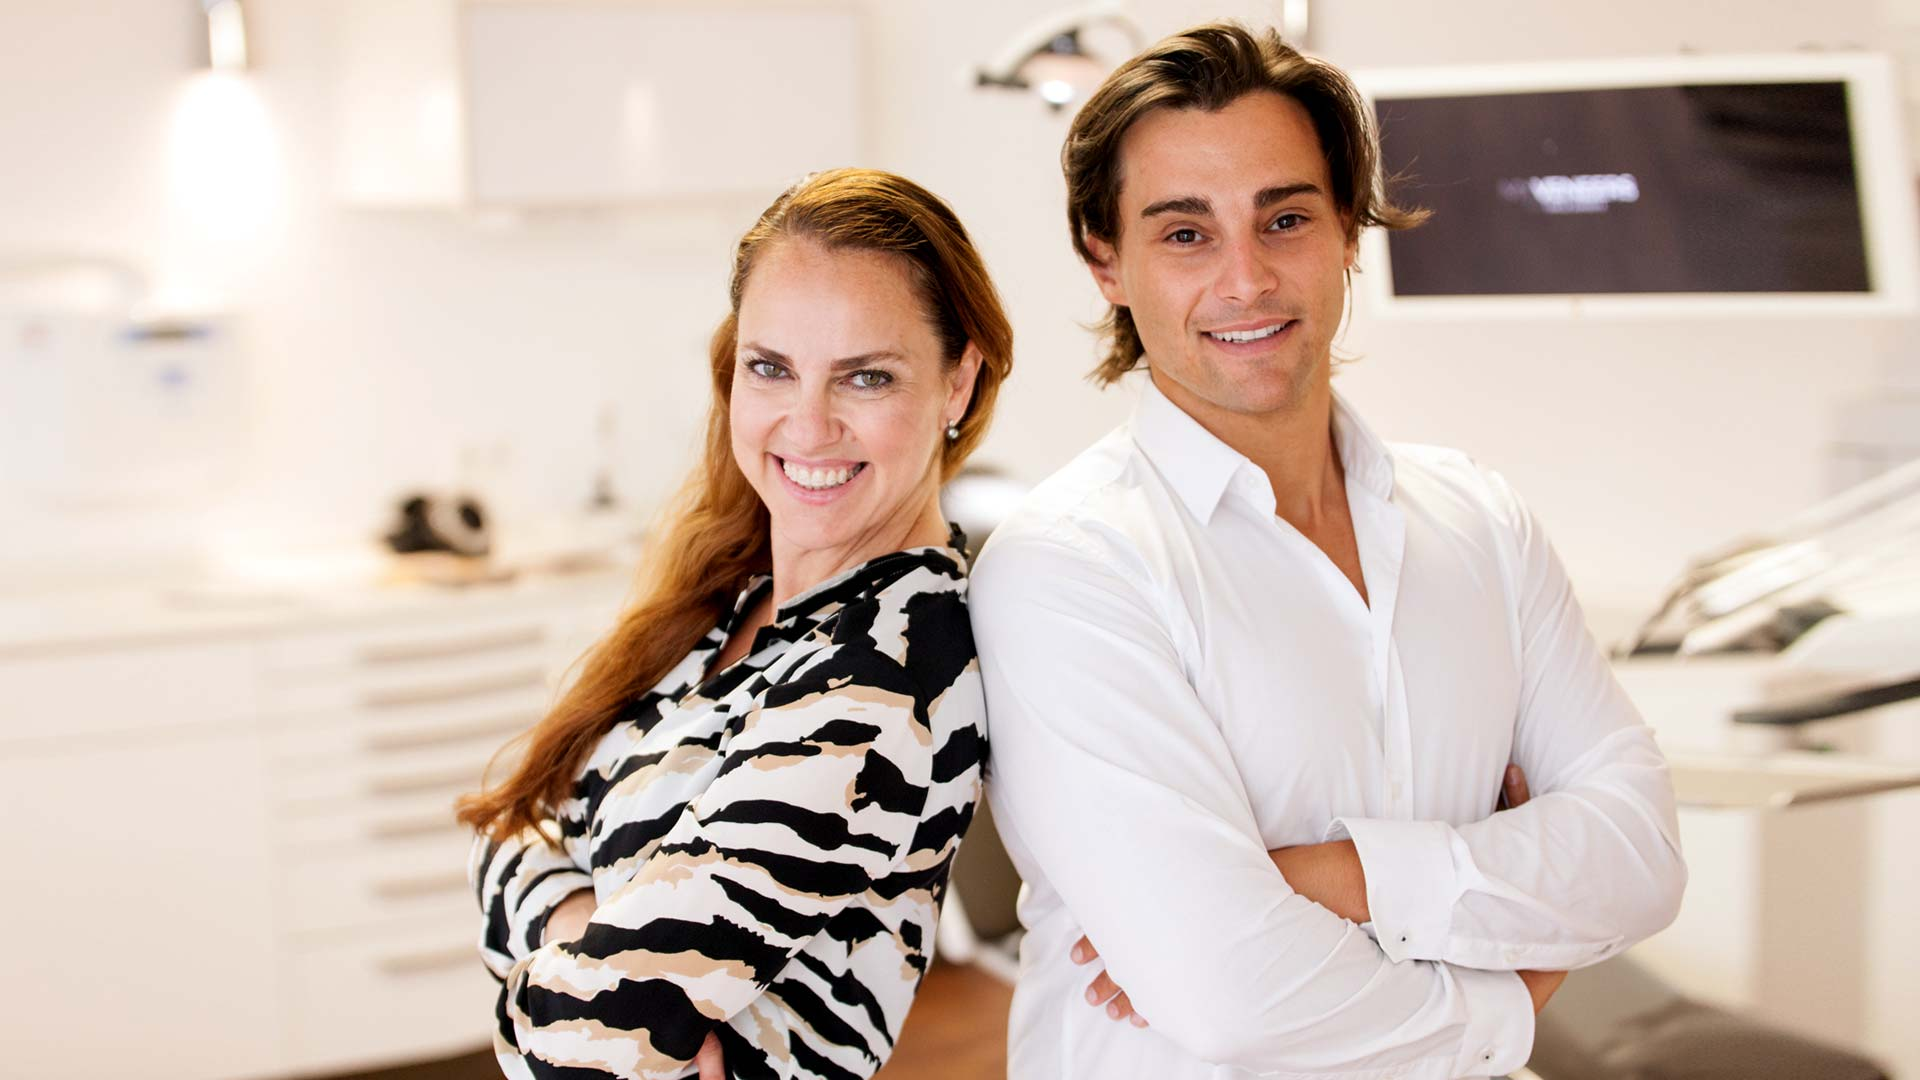 veneers-dr-tuna-baysal-zahnarzt-team-berlin-hamburg-muenchen-koeln-hollywood-smile-design-interview